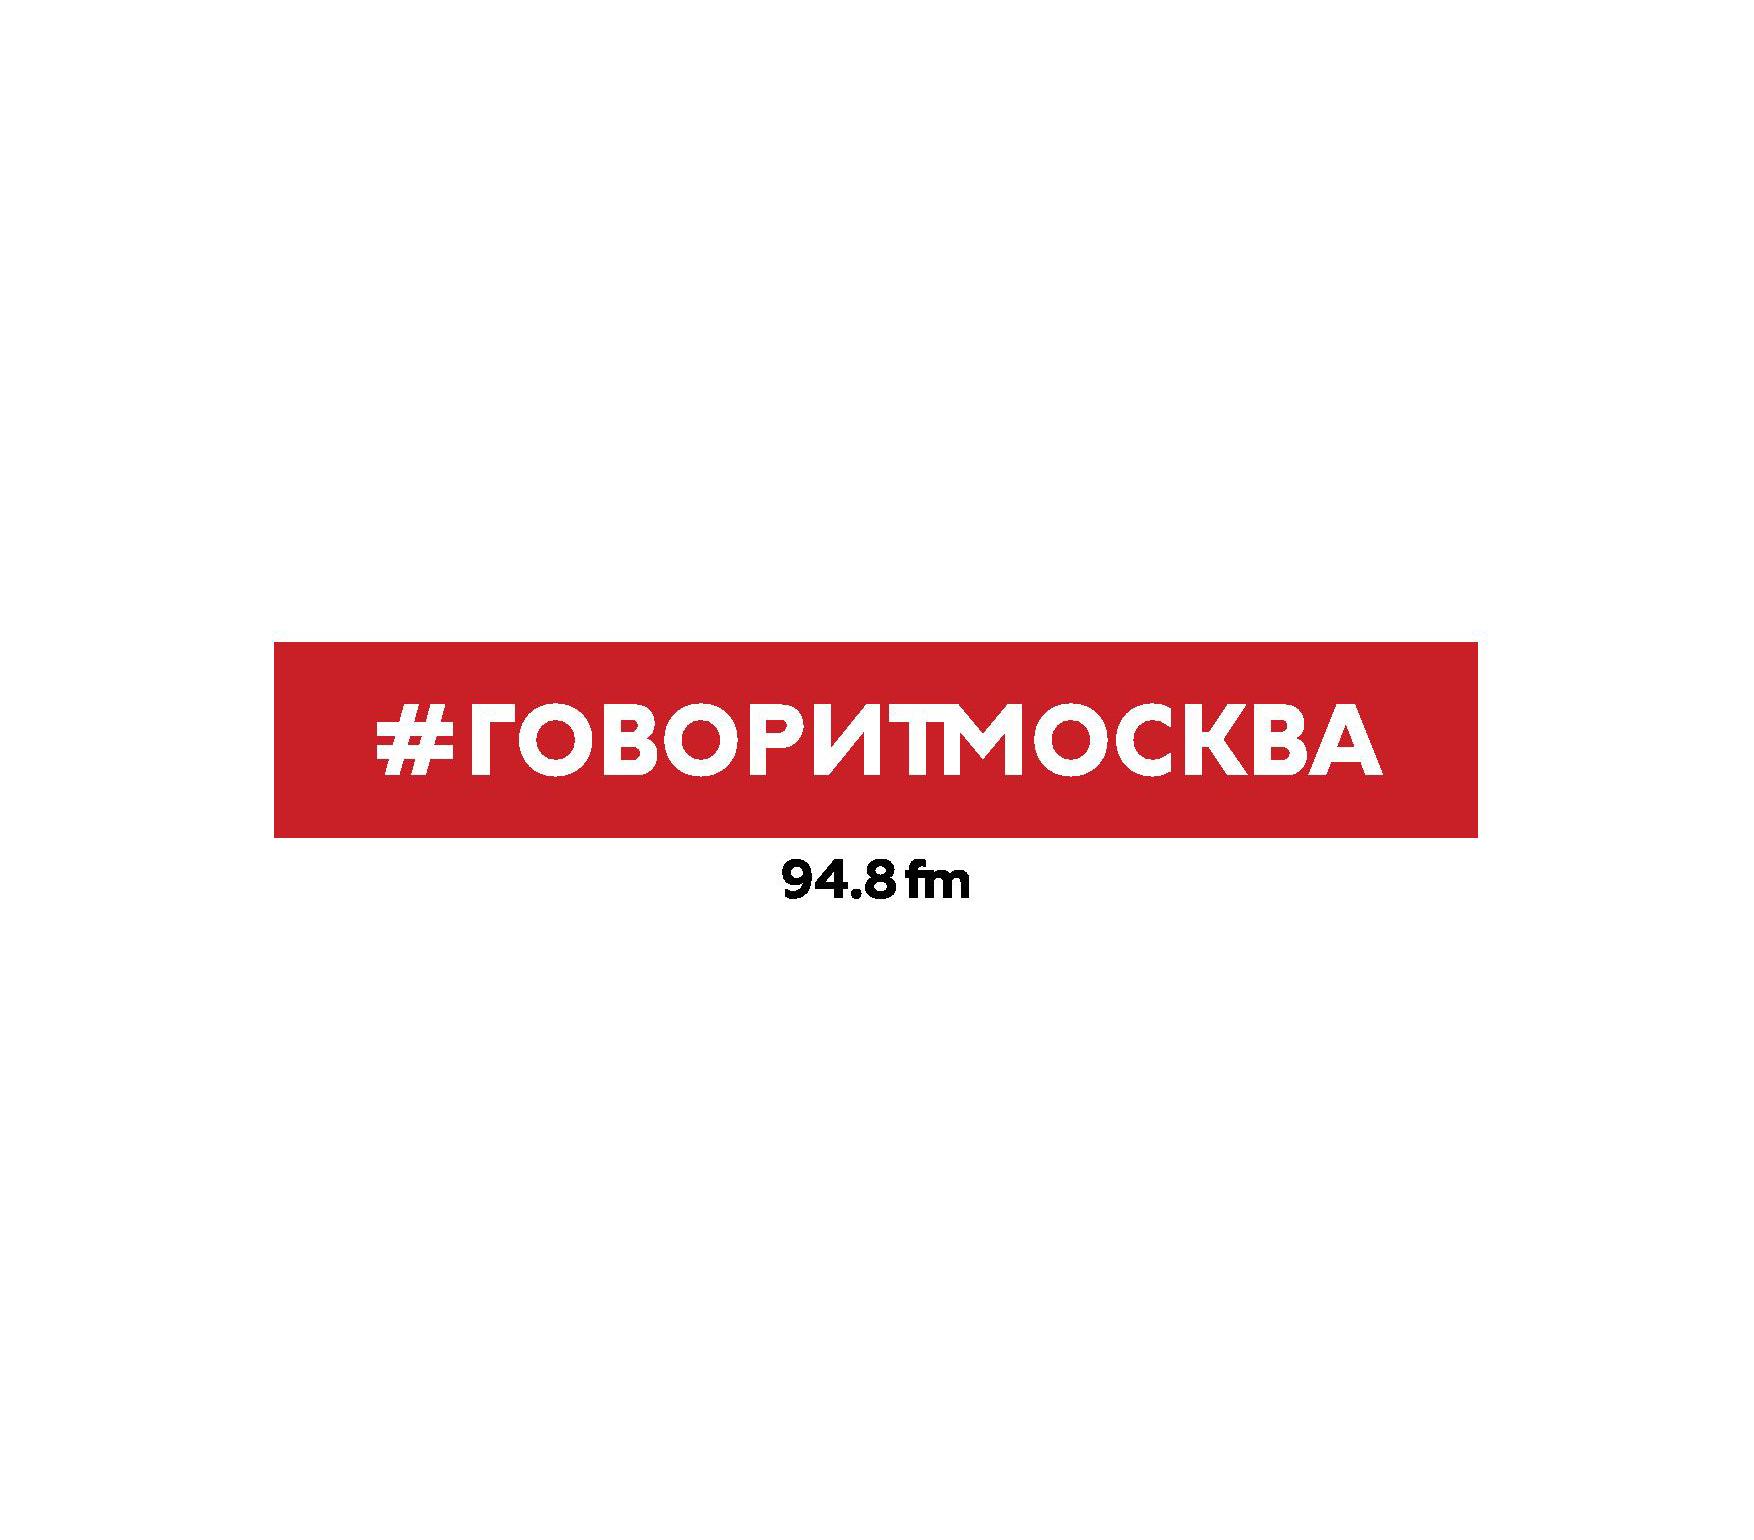 Макс Челноков 3 марта. Ксавье Моро макс челноков 5 мая марат гельман